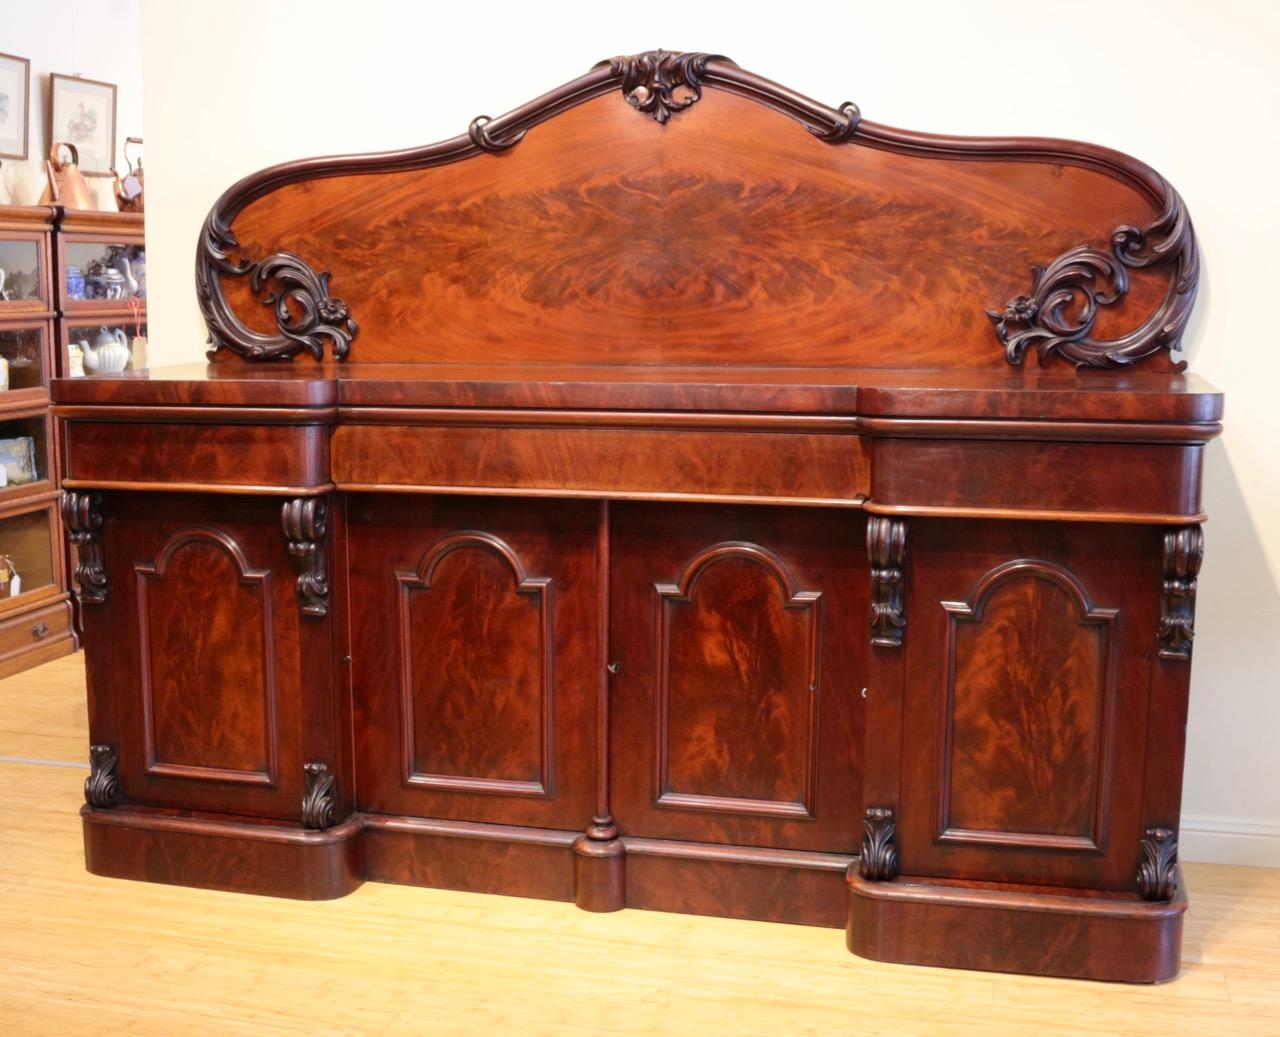 Antique 19th Century Australian Cedar Sideboard The